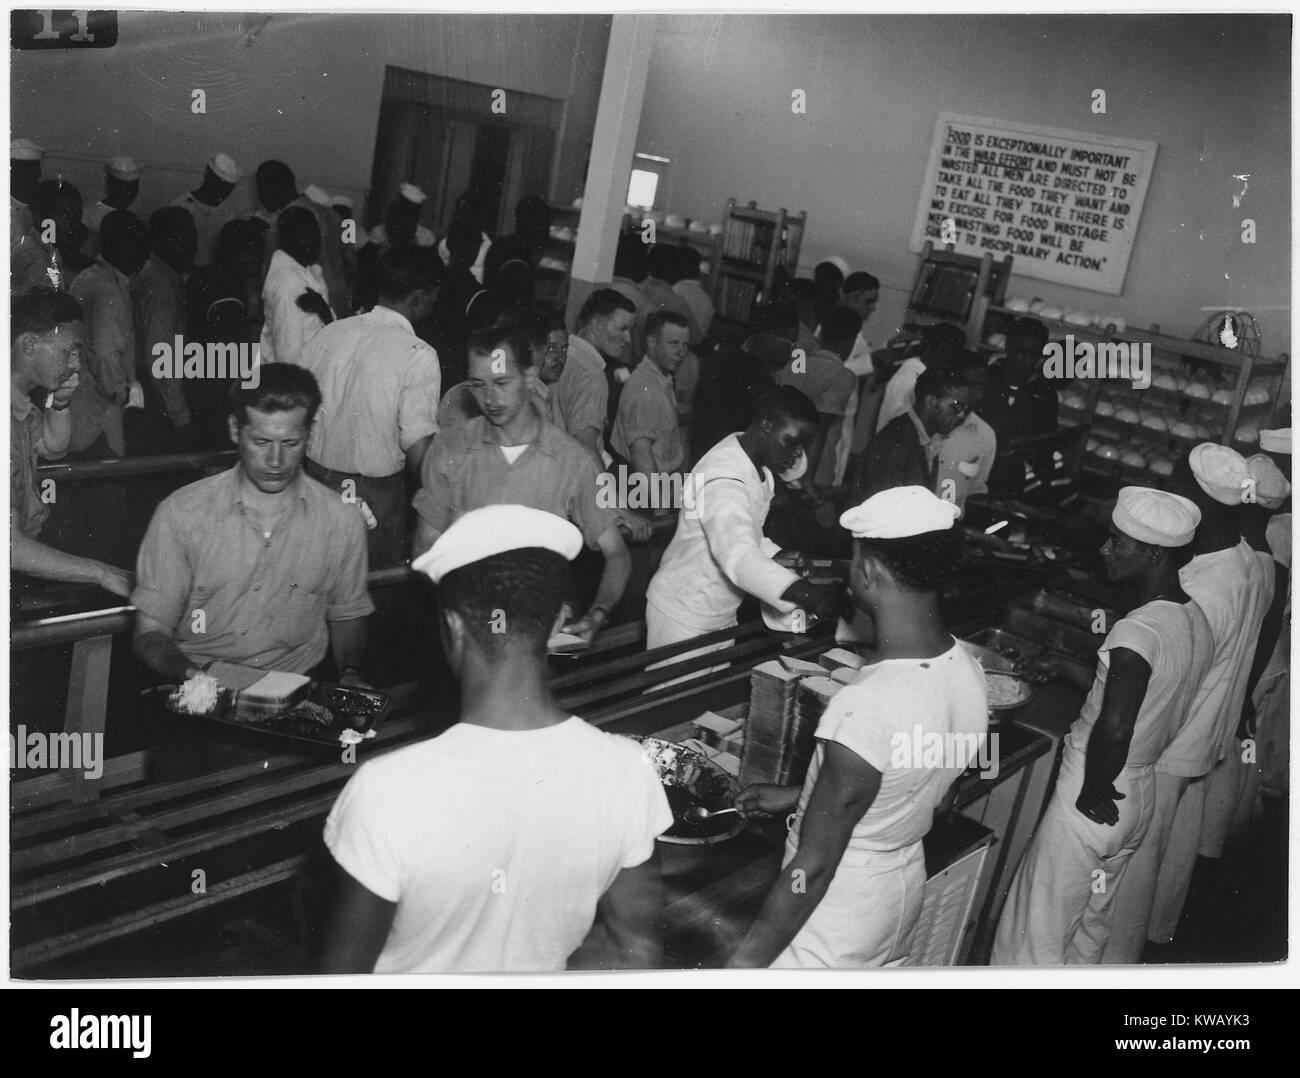 Men stand in lines in the mess hall for naval barracks in Hastings, Nebraska, 1944. - Stock Image